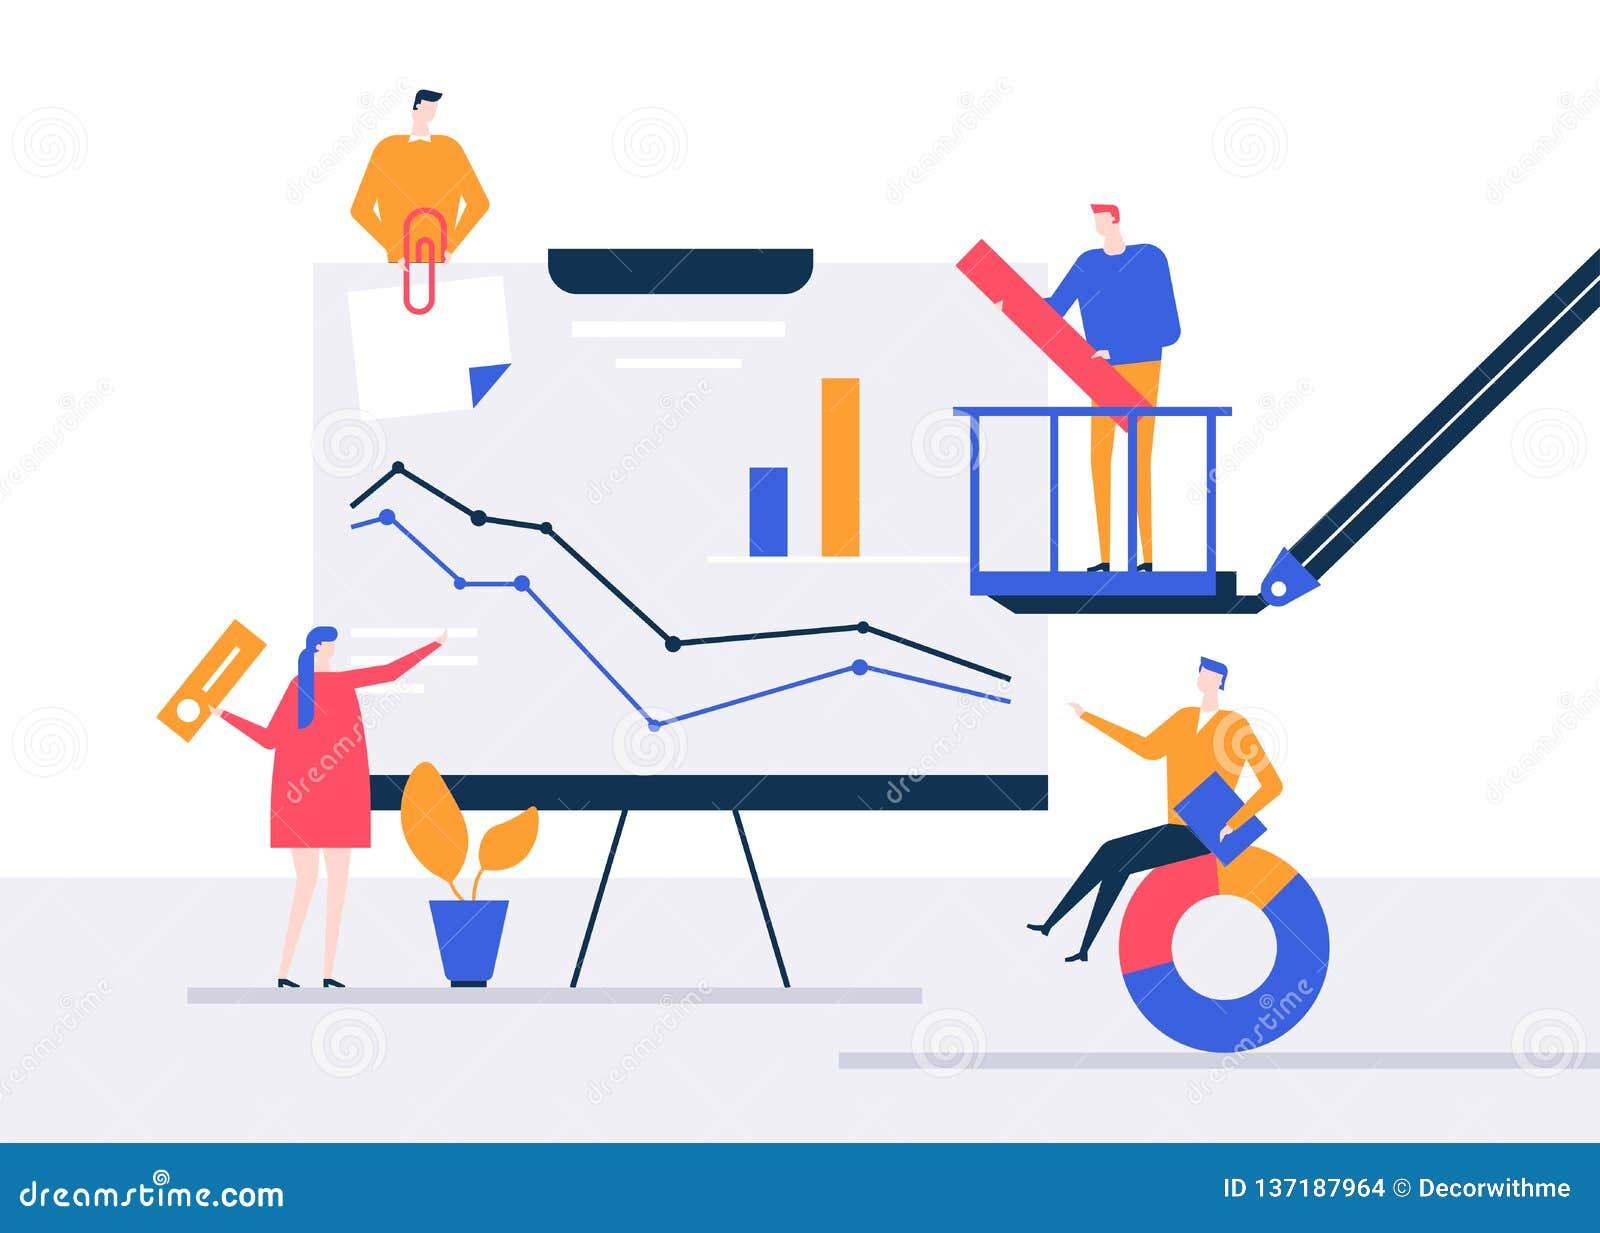 Data Analysis - Flat Design Style Colorful Illustration